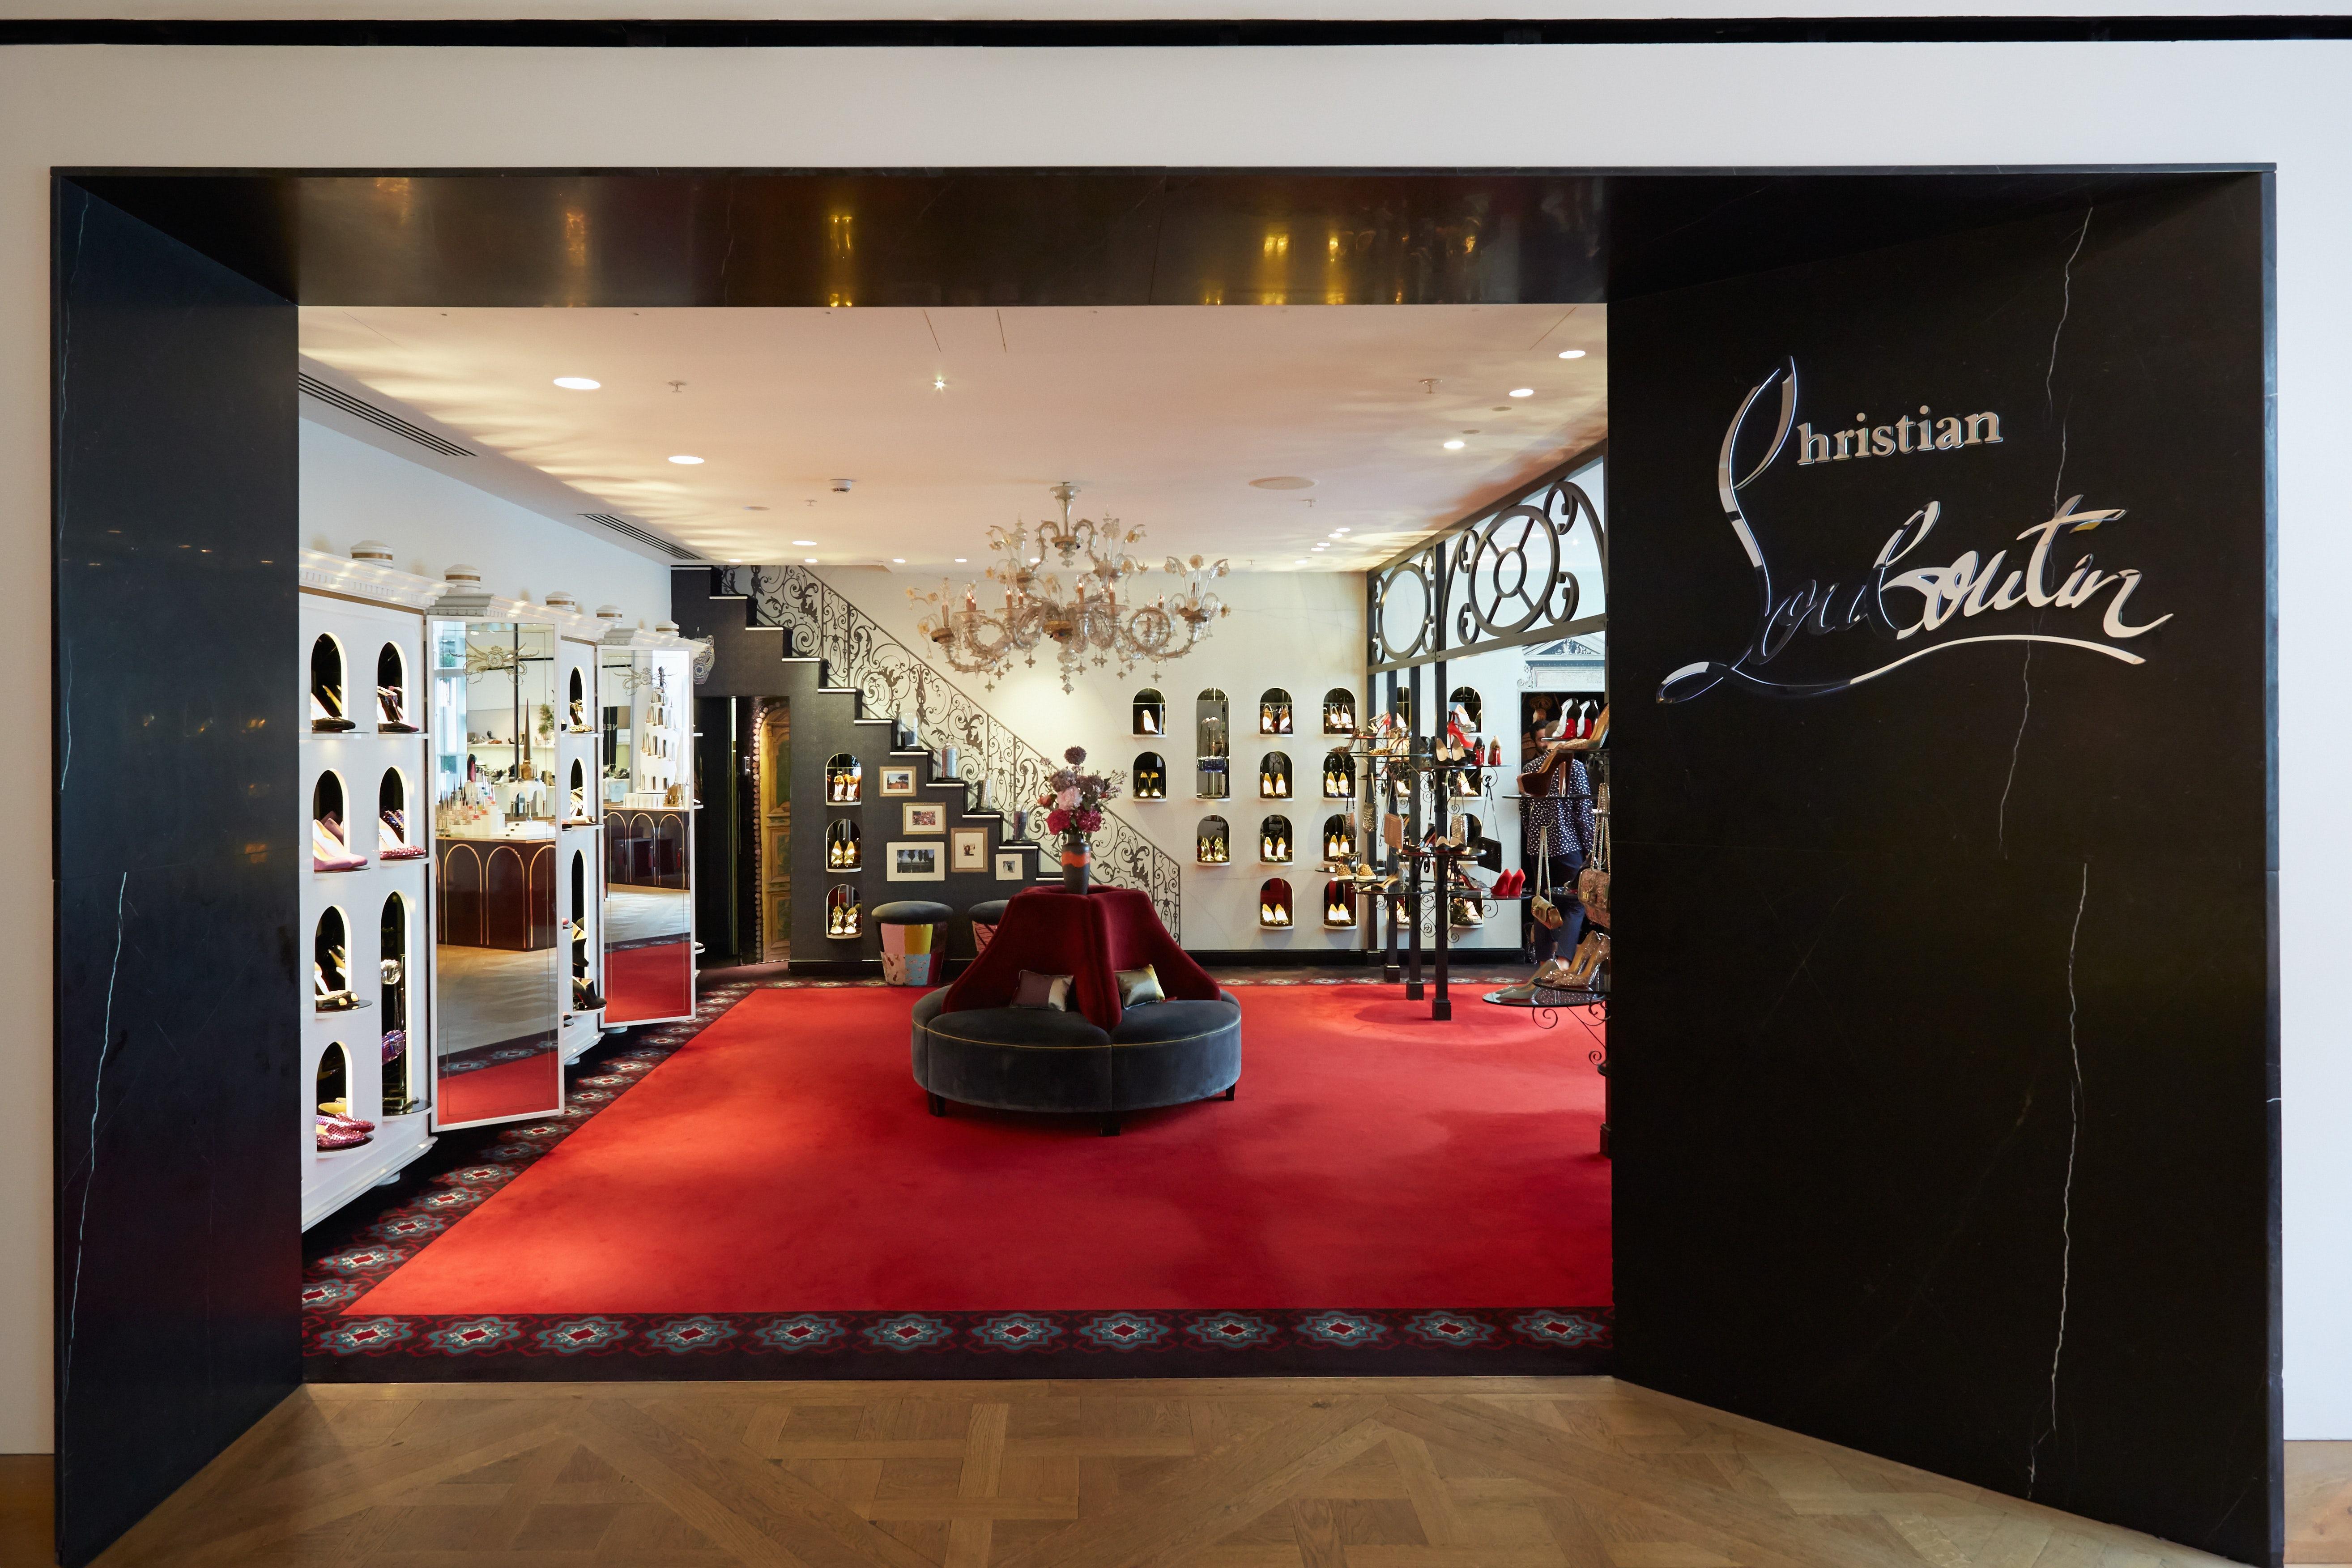 Christian Louboutin store | Source: Shutterstock